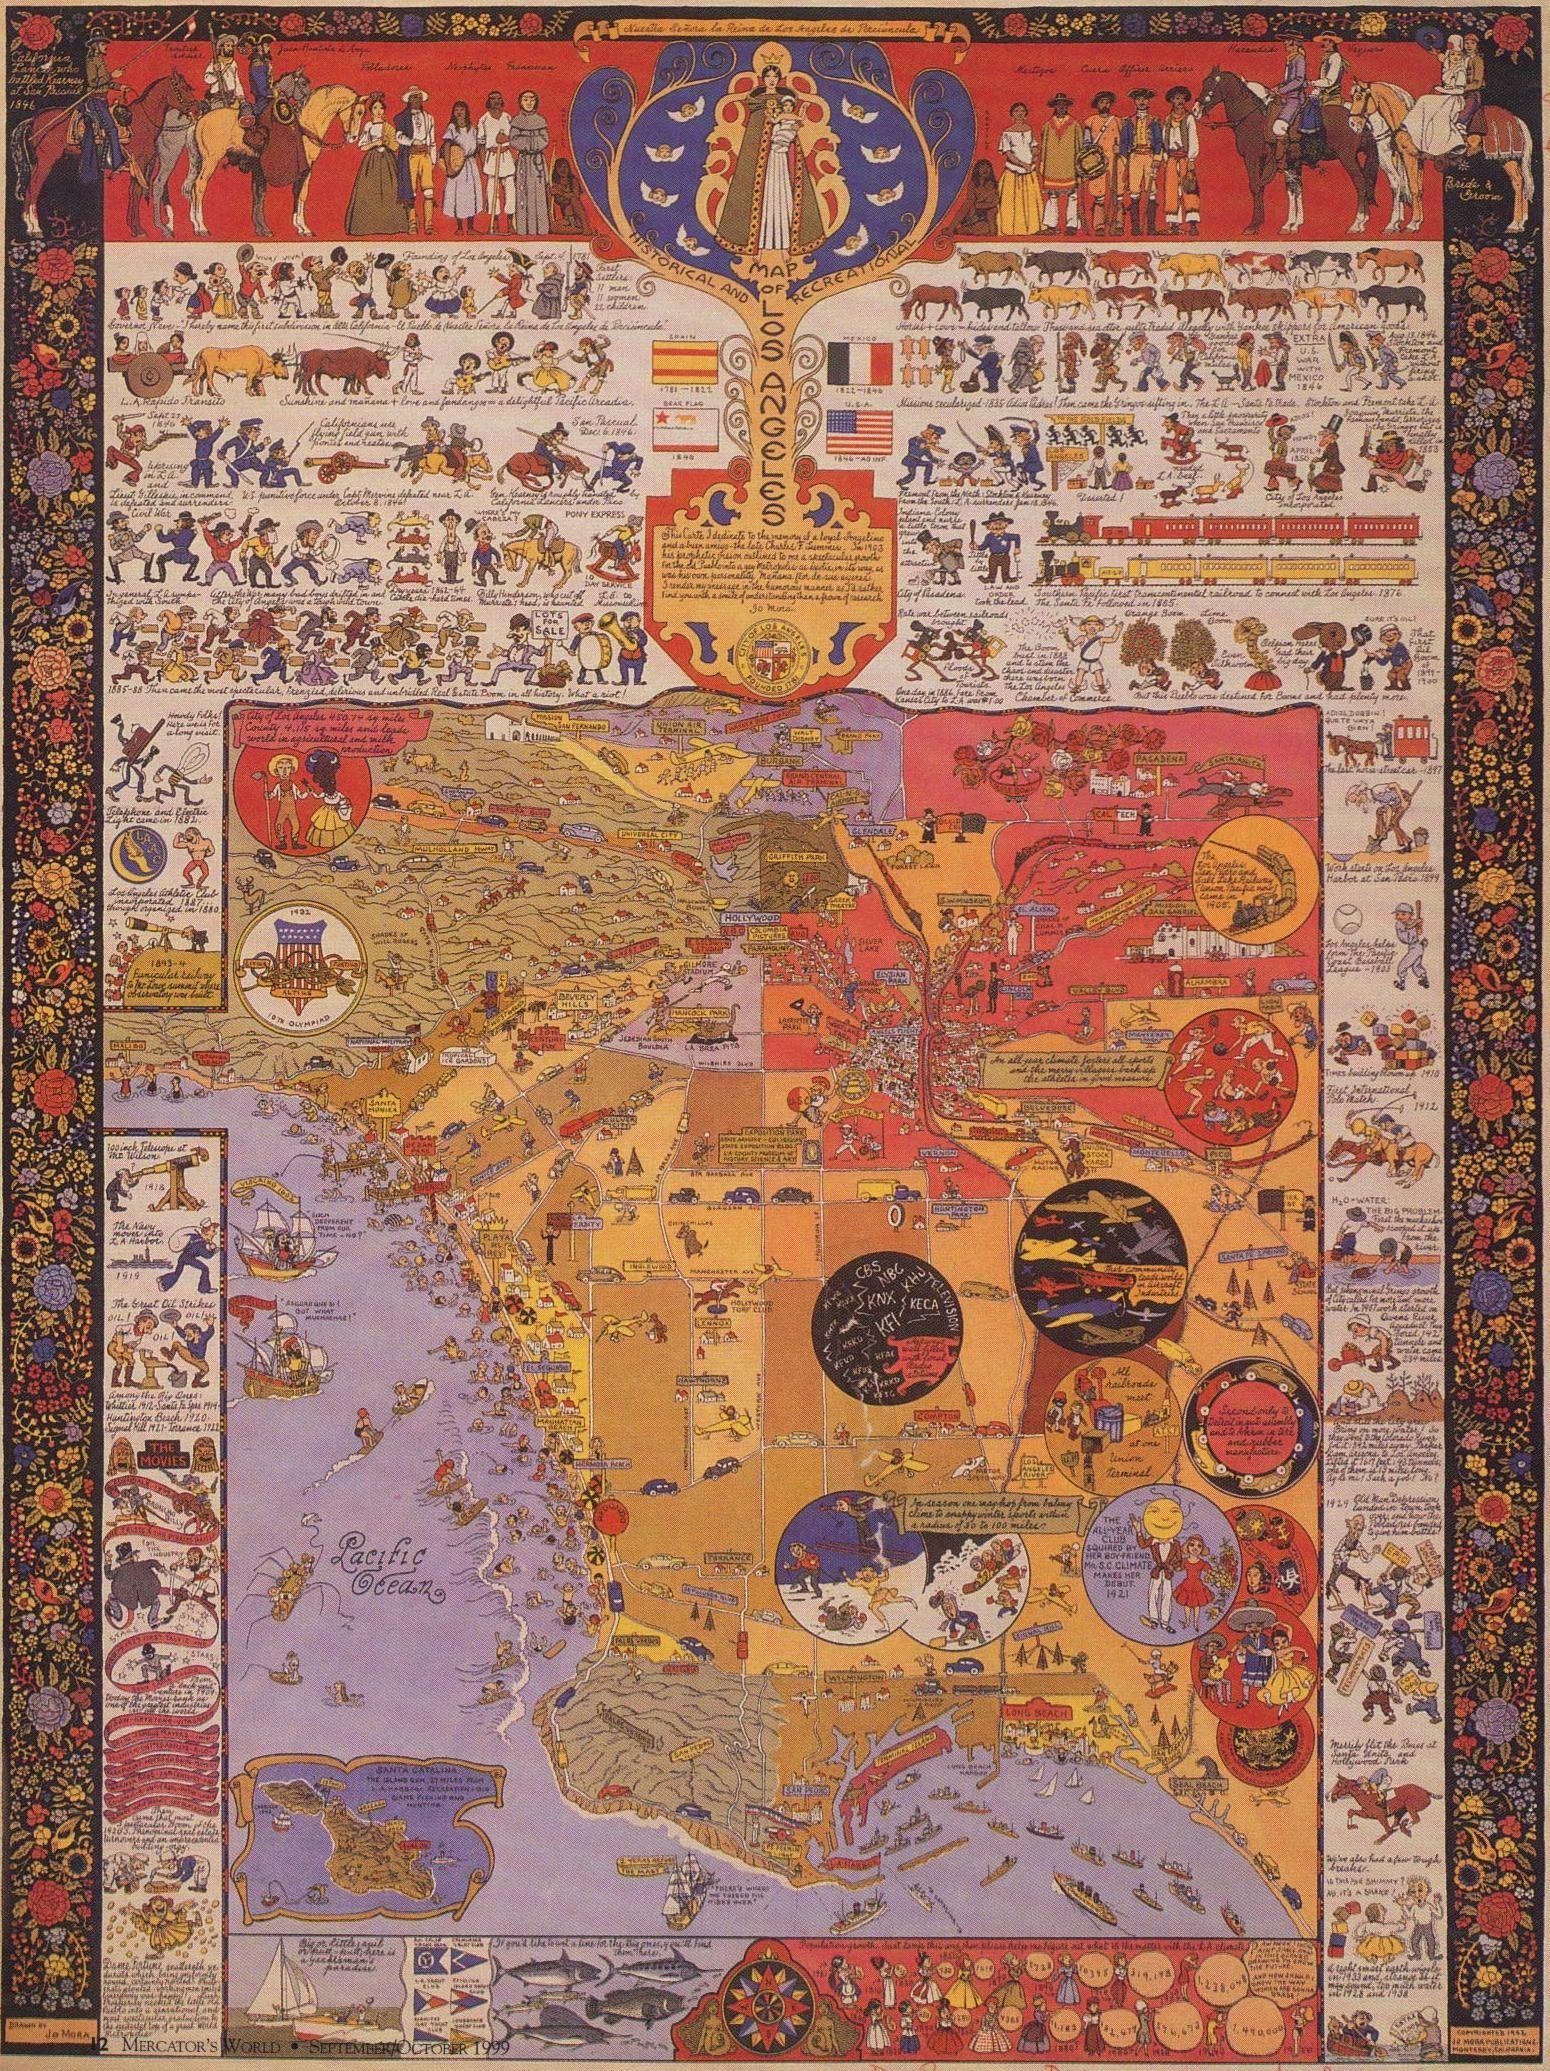 Jo Mora Poster Of Los Angeles Maps Pinterest Columns We And - Jo mora los angeles map